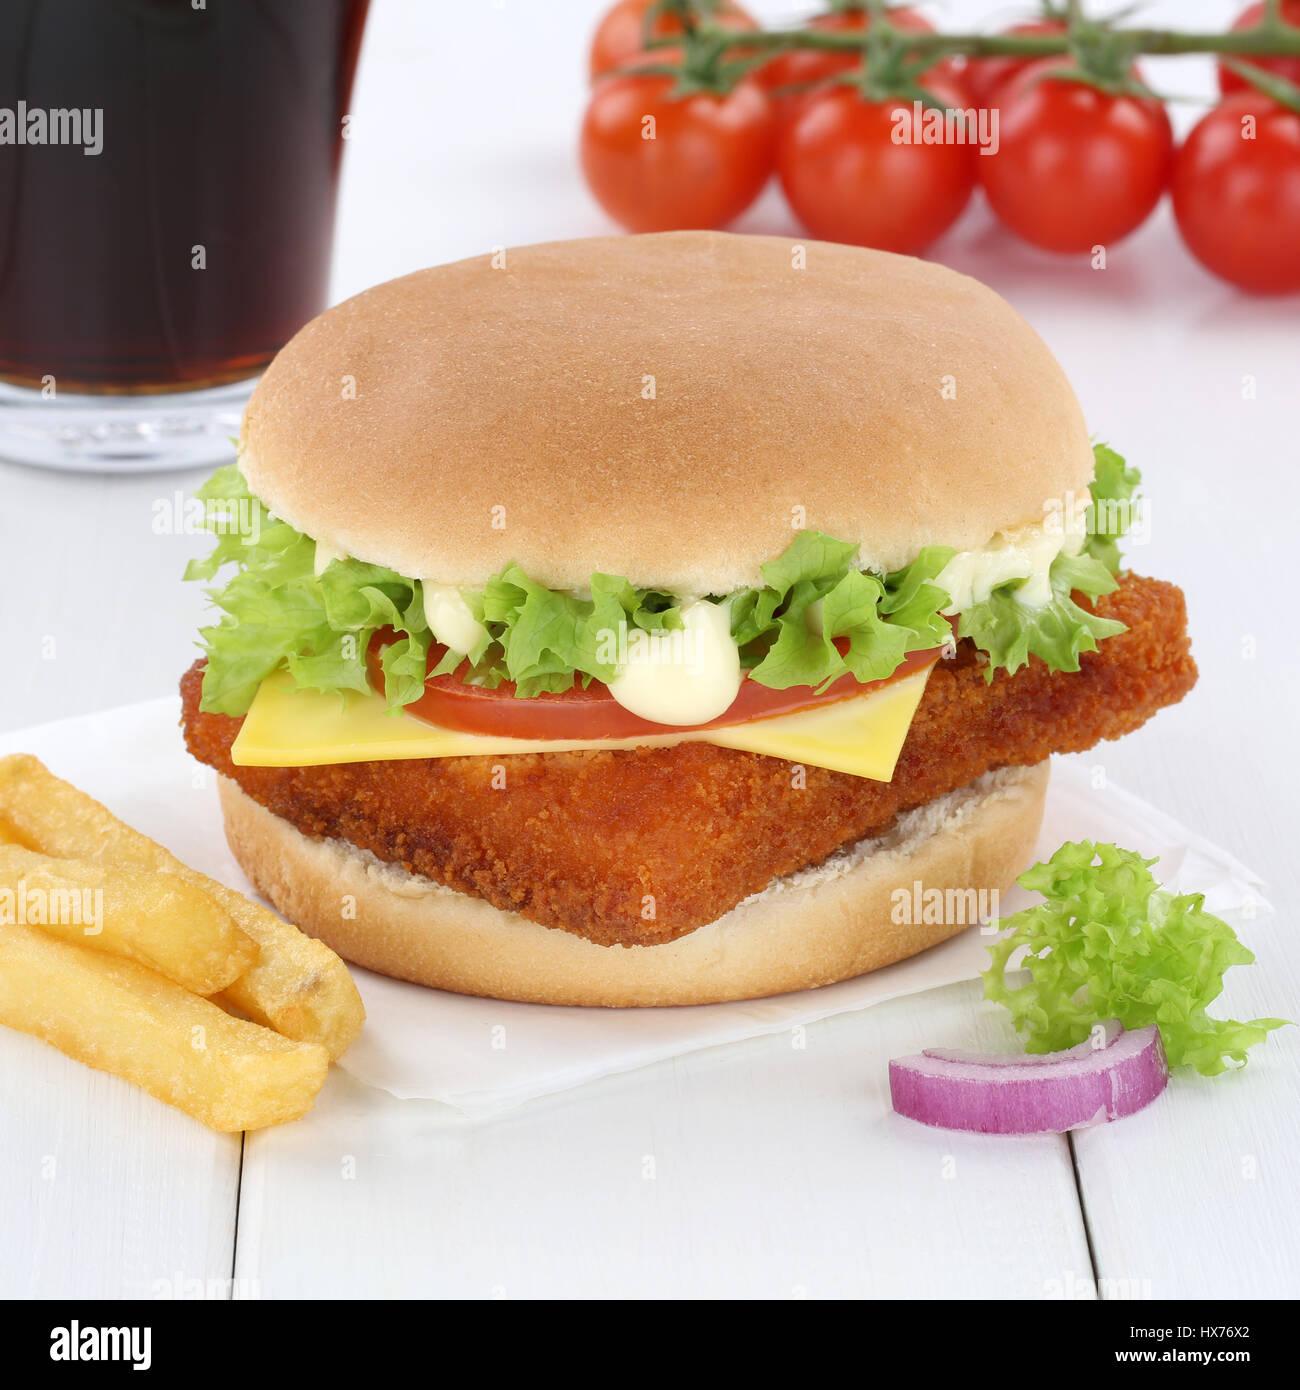 Fisch Burger Fishburger Hamburger Menü Essen Cola trinken Fastfood Stockbild